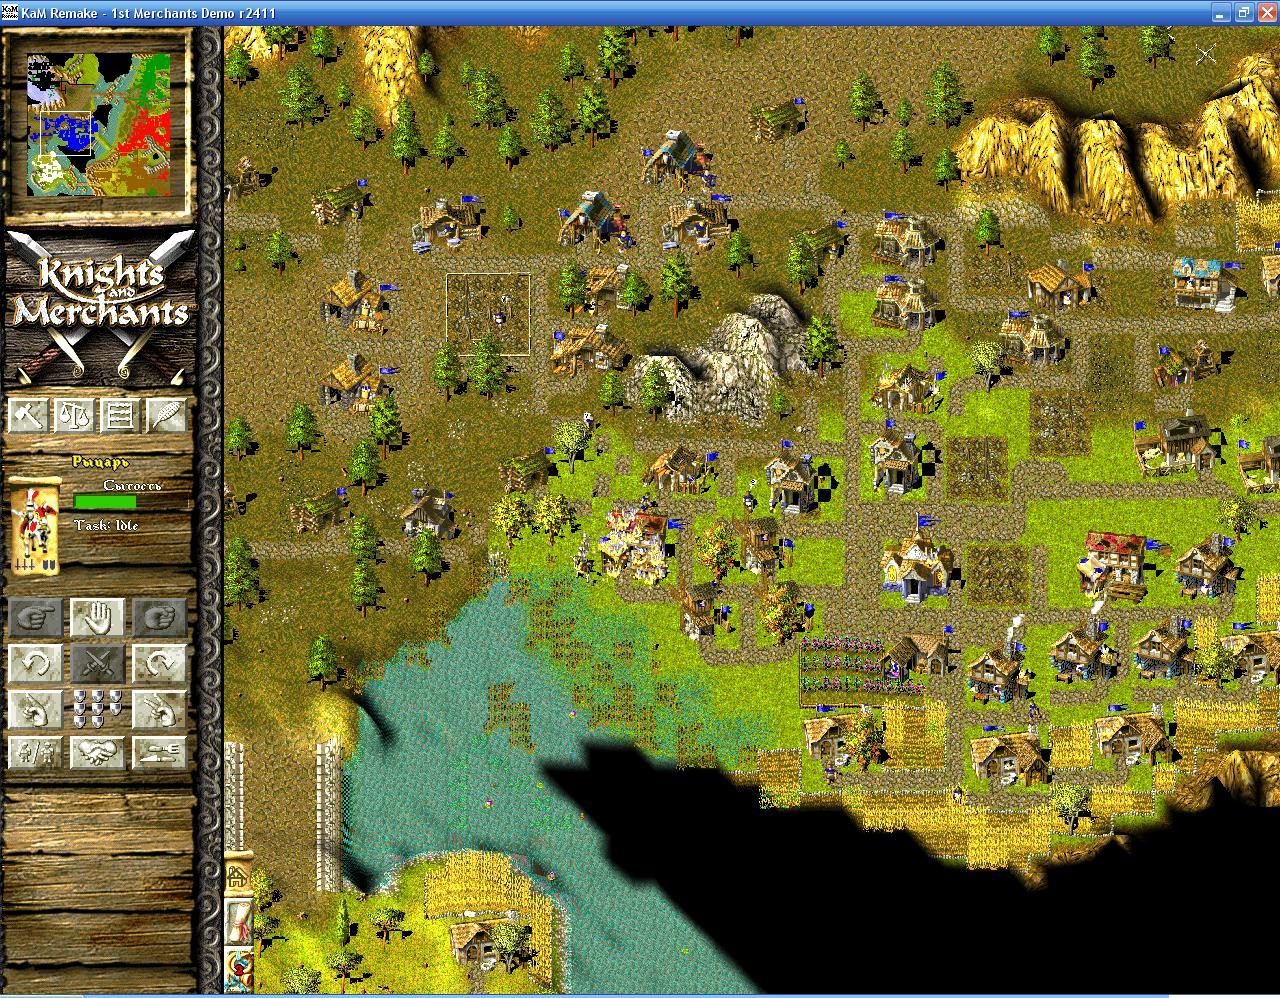 King.JPG - Knights & Merchants: The Peasants Rebellion